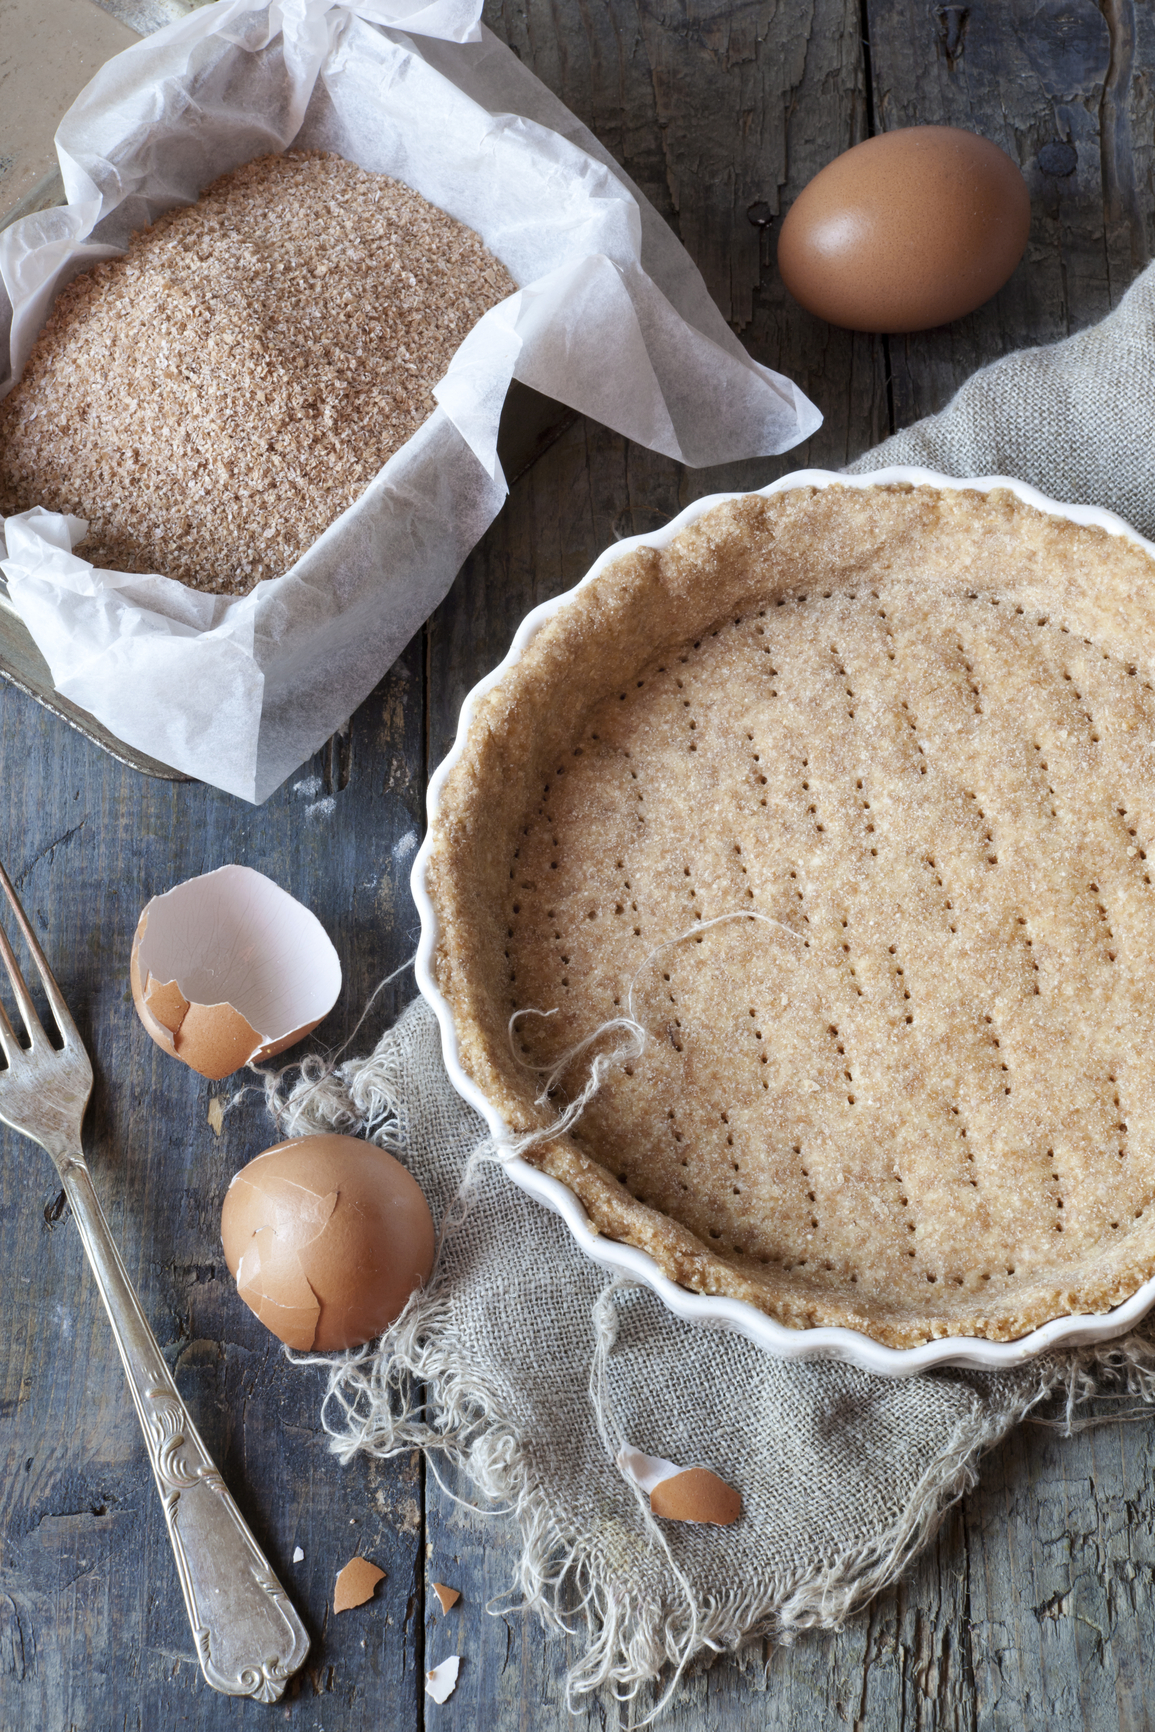 Pate Brisee (Pasta